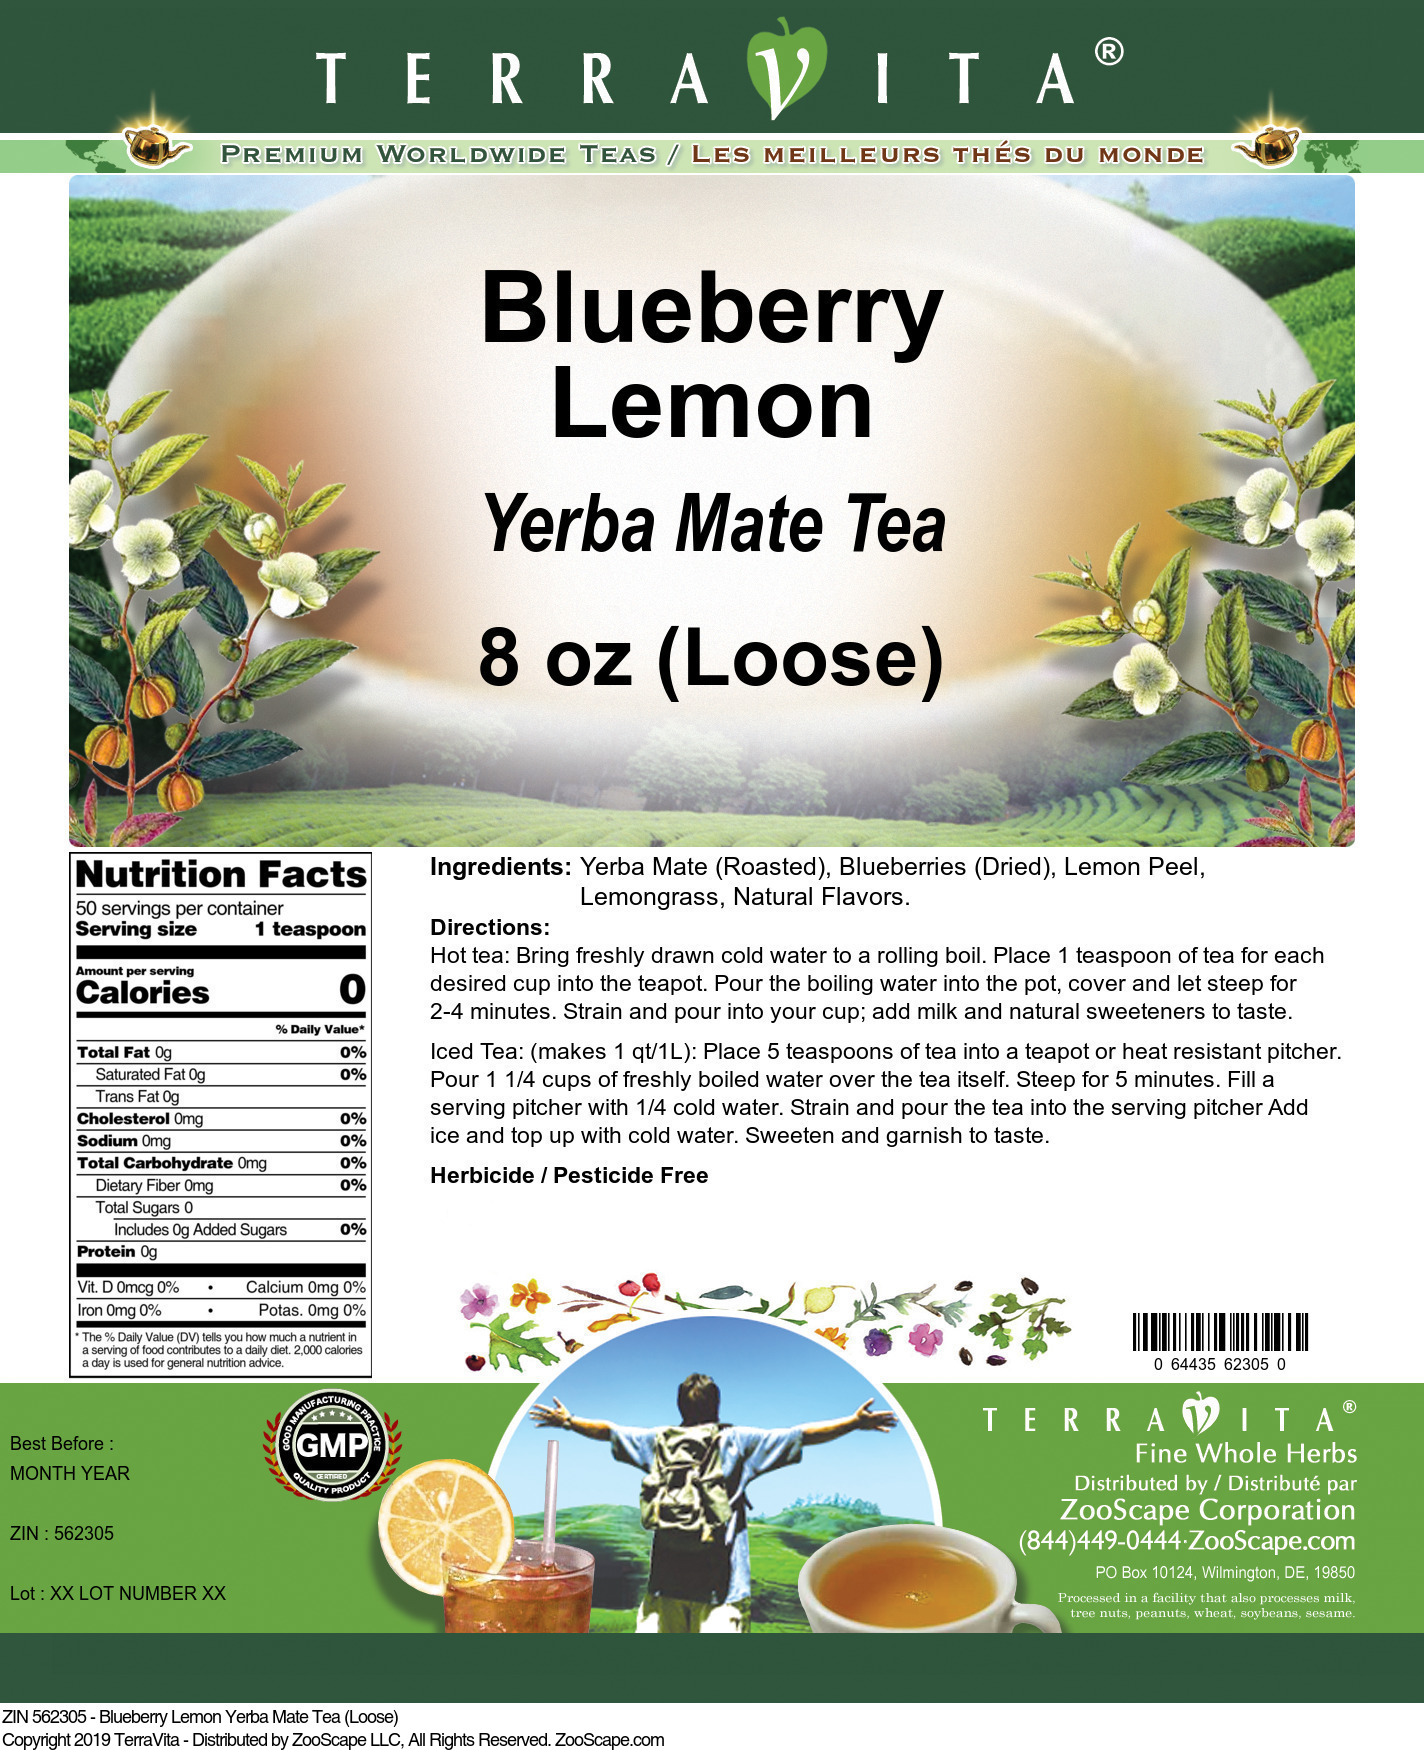 Blueberry Lemon Yerba Mate